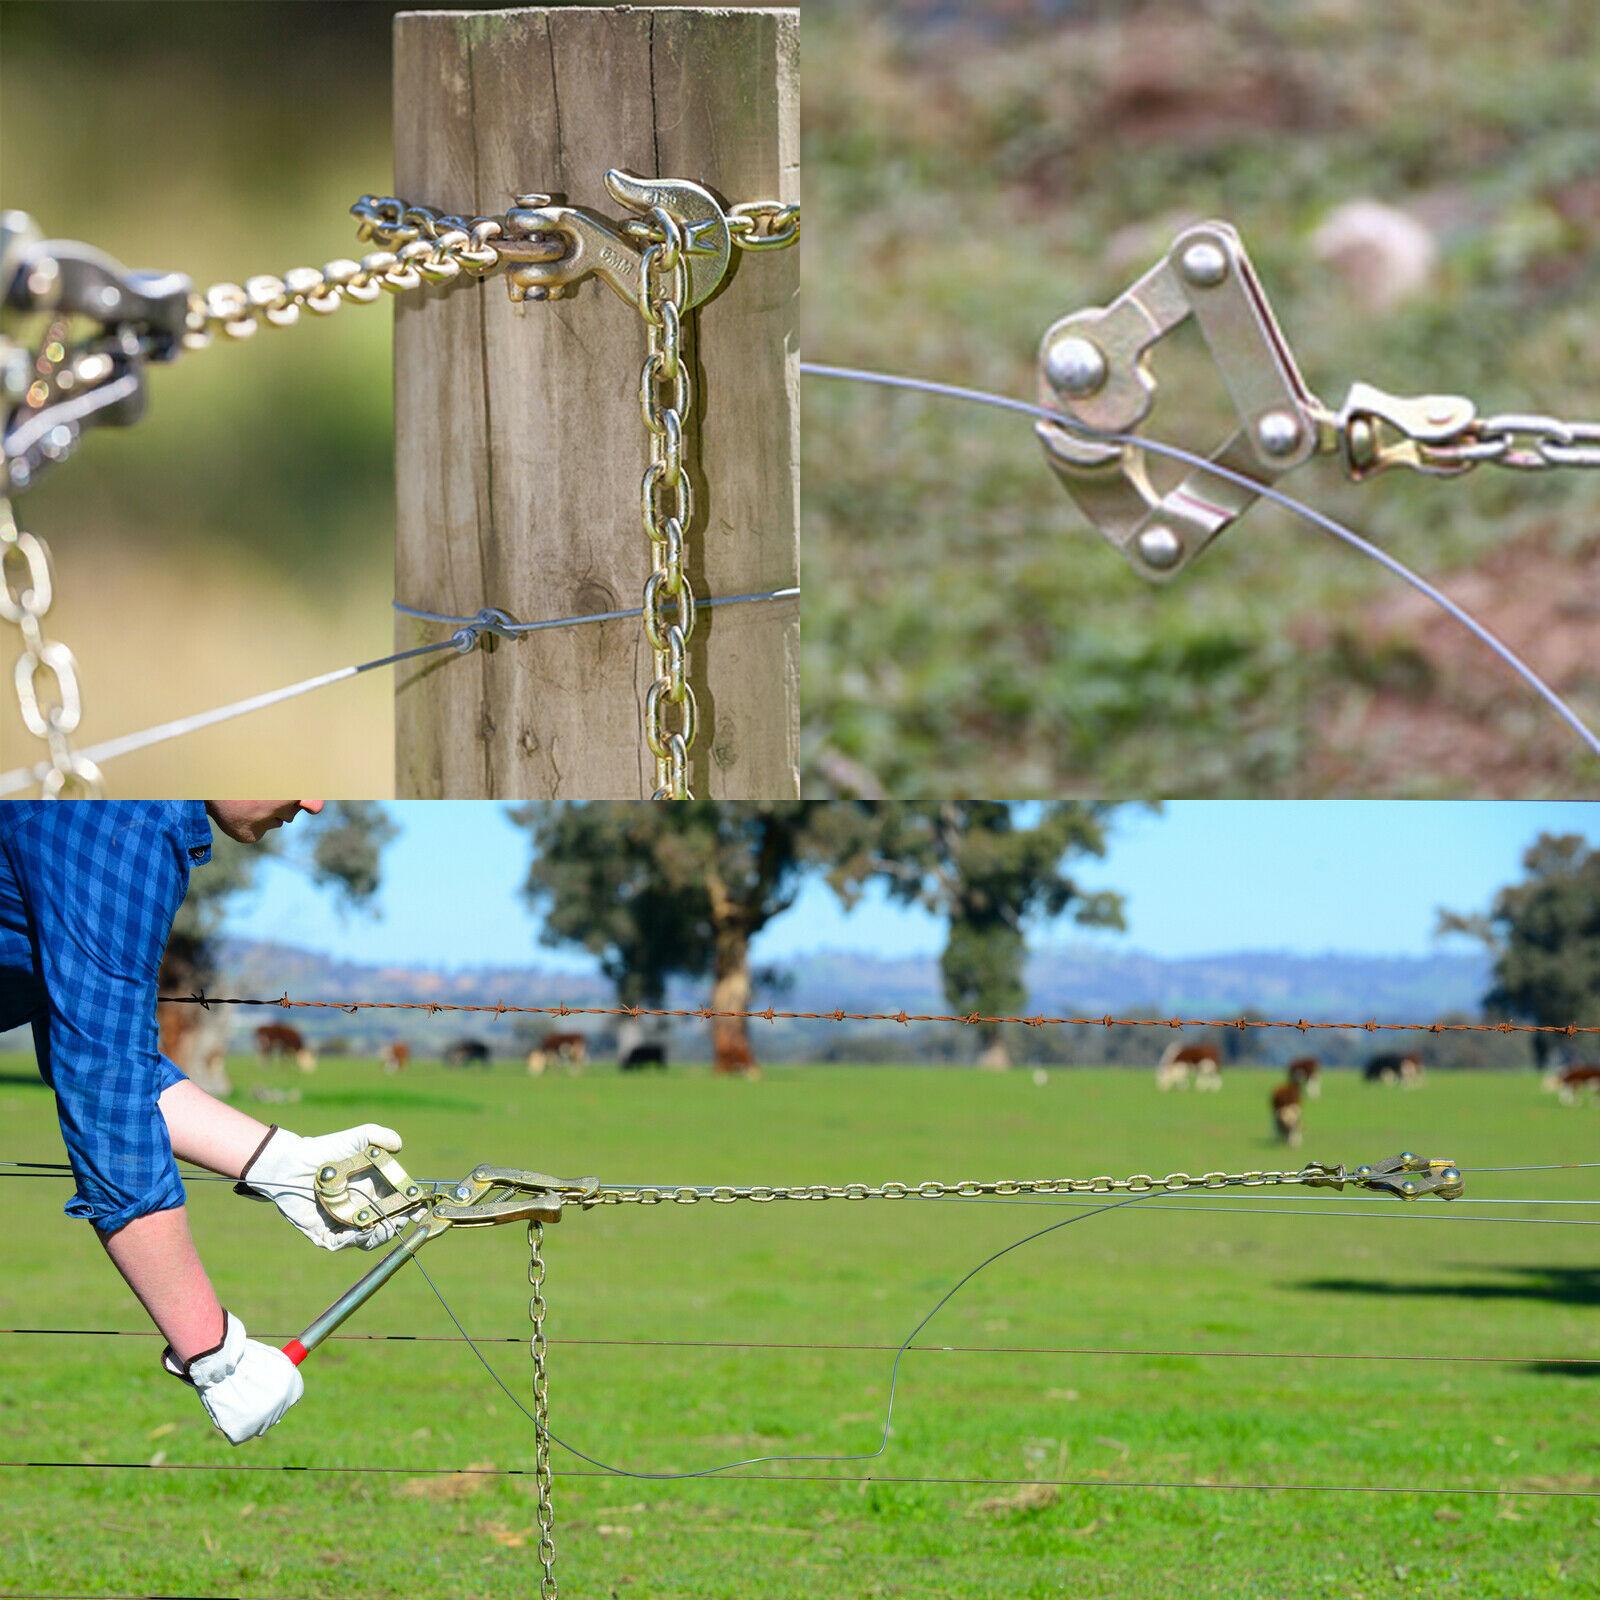 Fencing Chain Strainer Cattle Barn Farm Fence Stretcher Tensioner Repair Barbed Wire Msgconstrutora Com Br